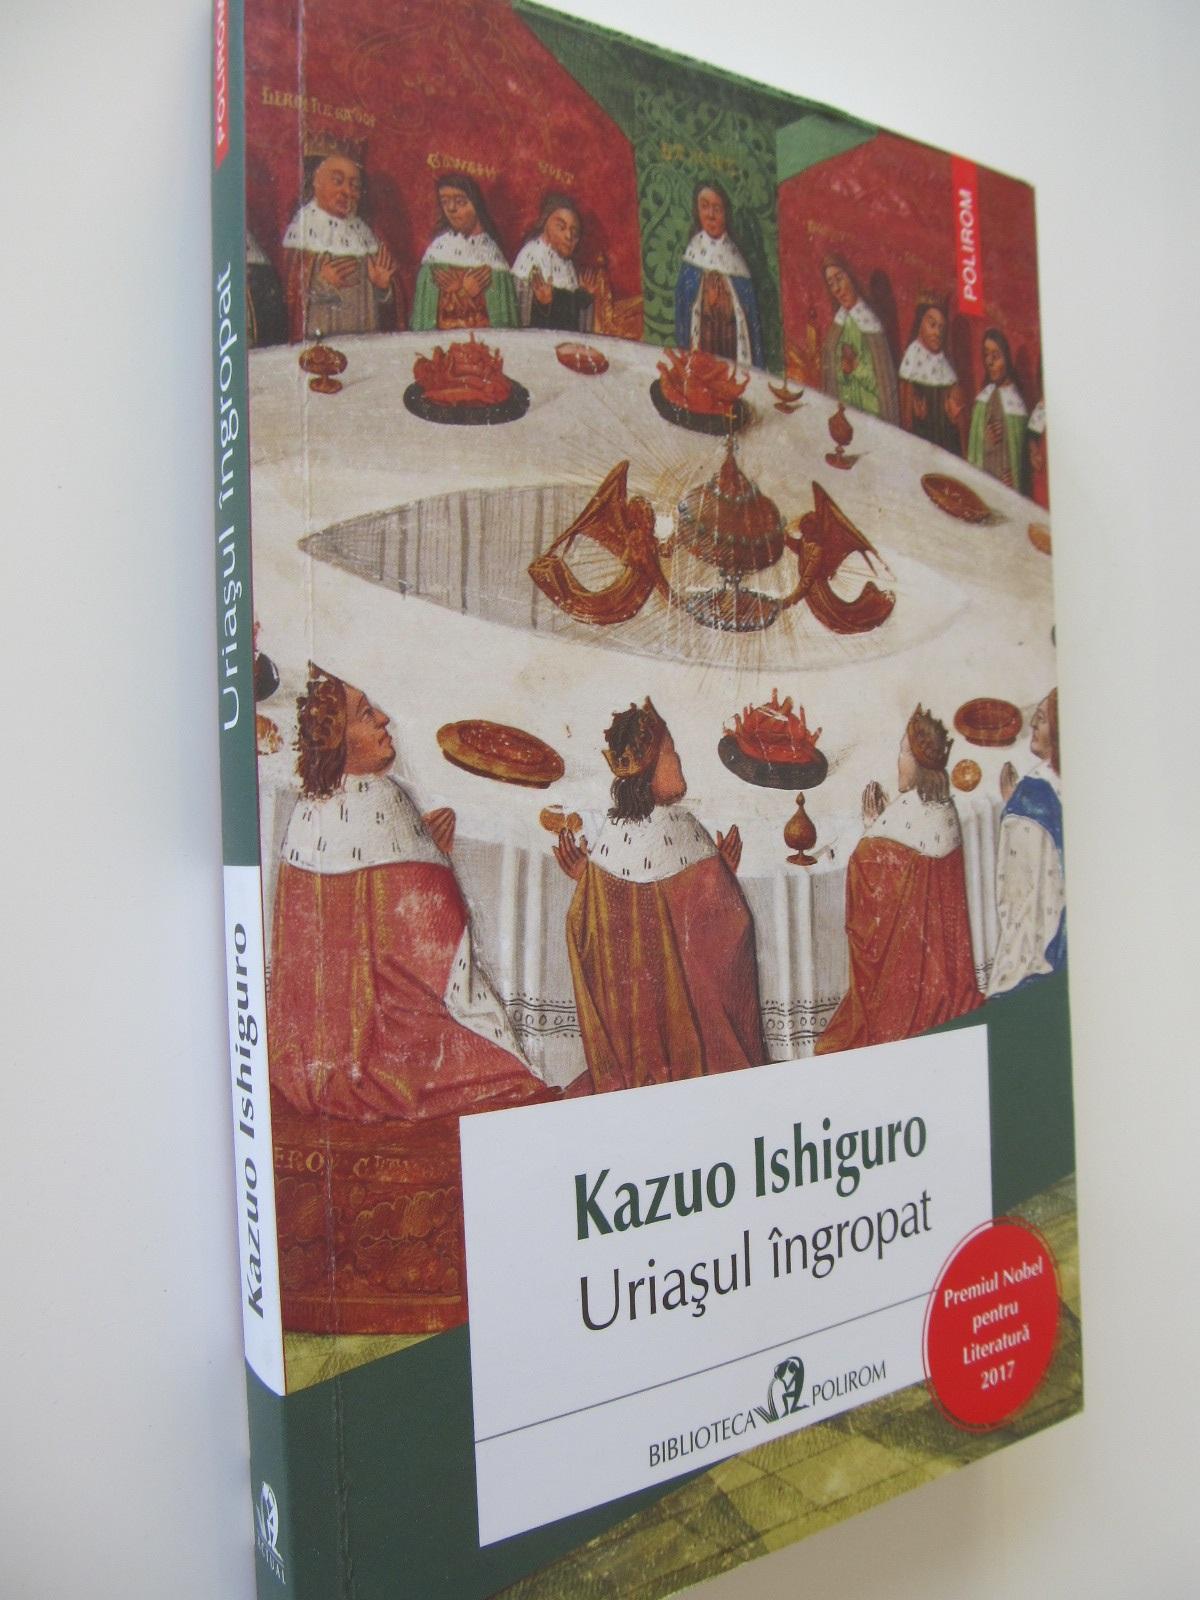 Uriasul ingropat - Kazuo Ishiguro | Detalii carte